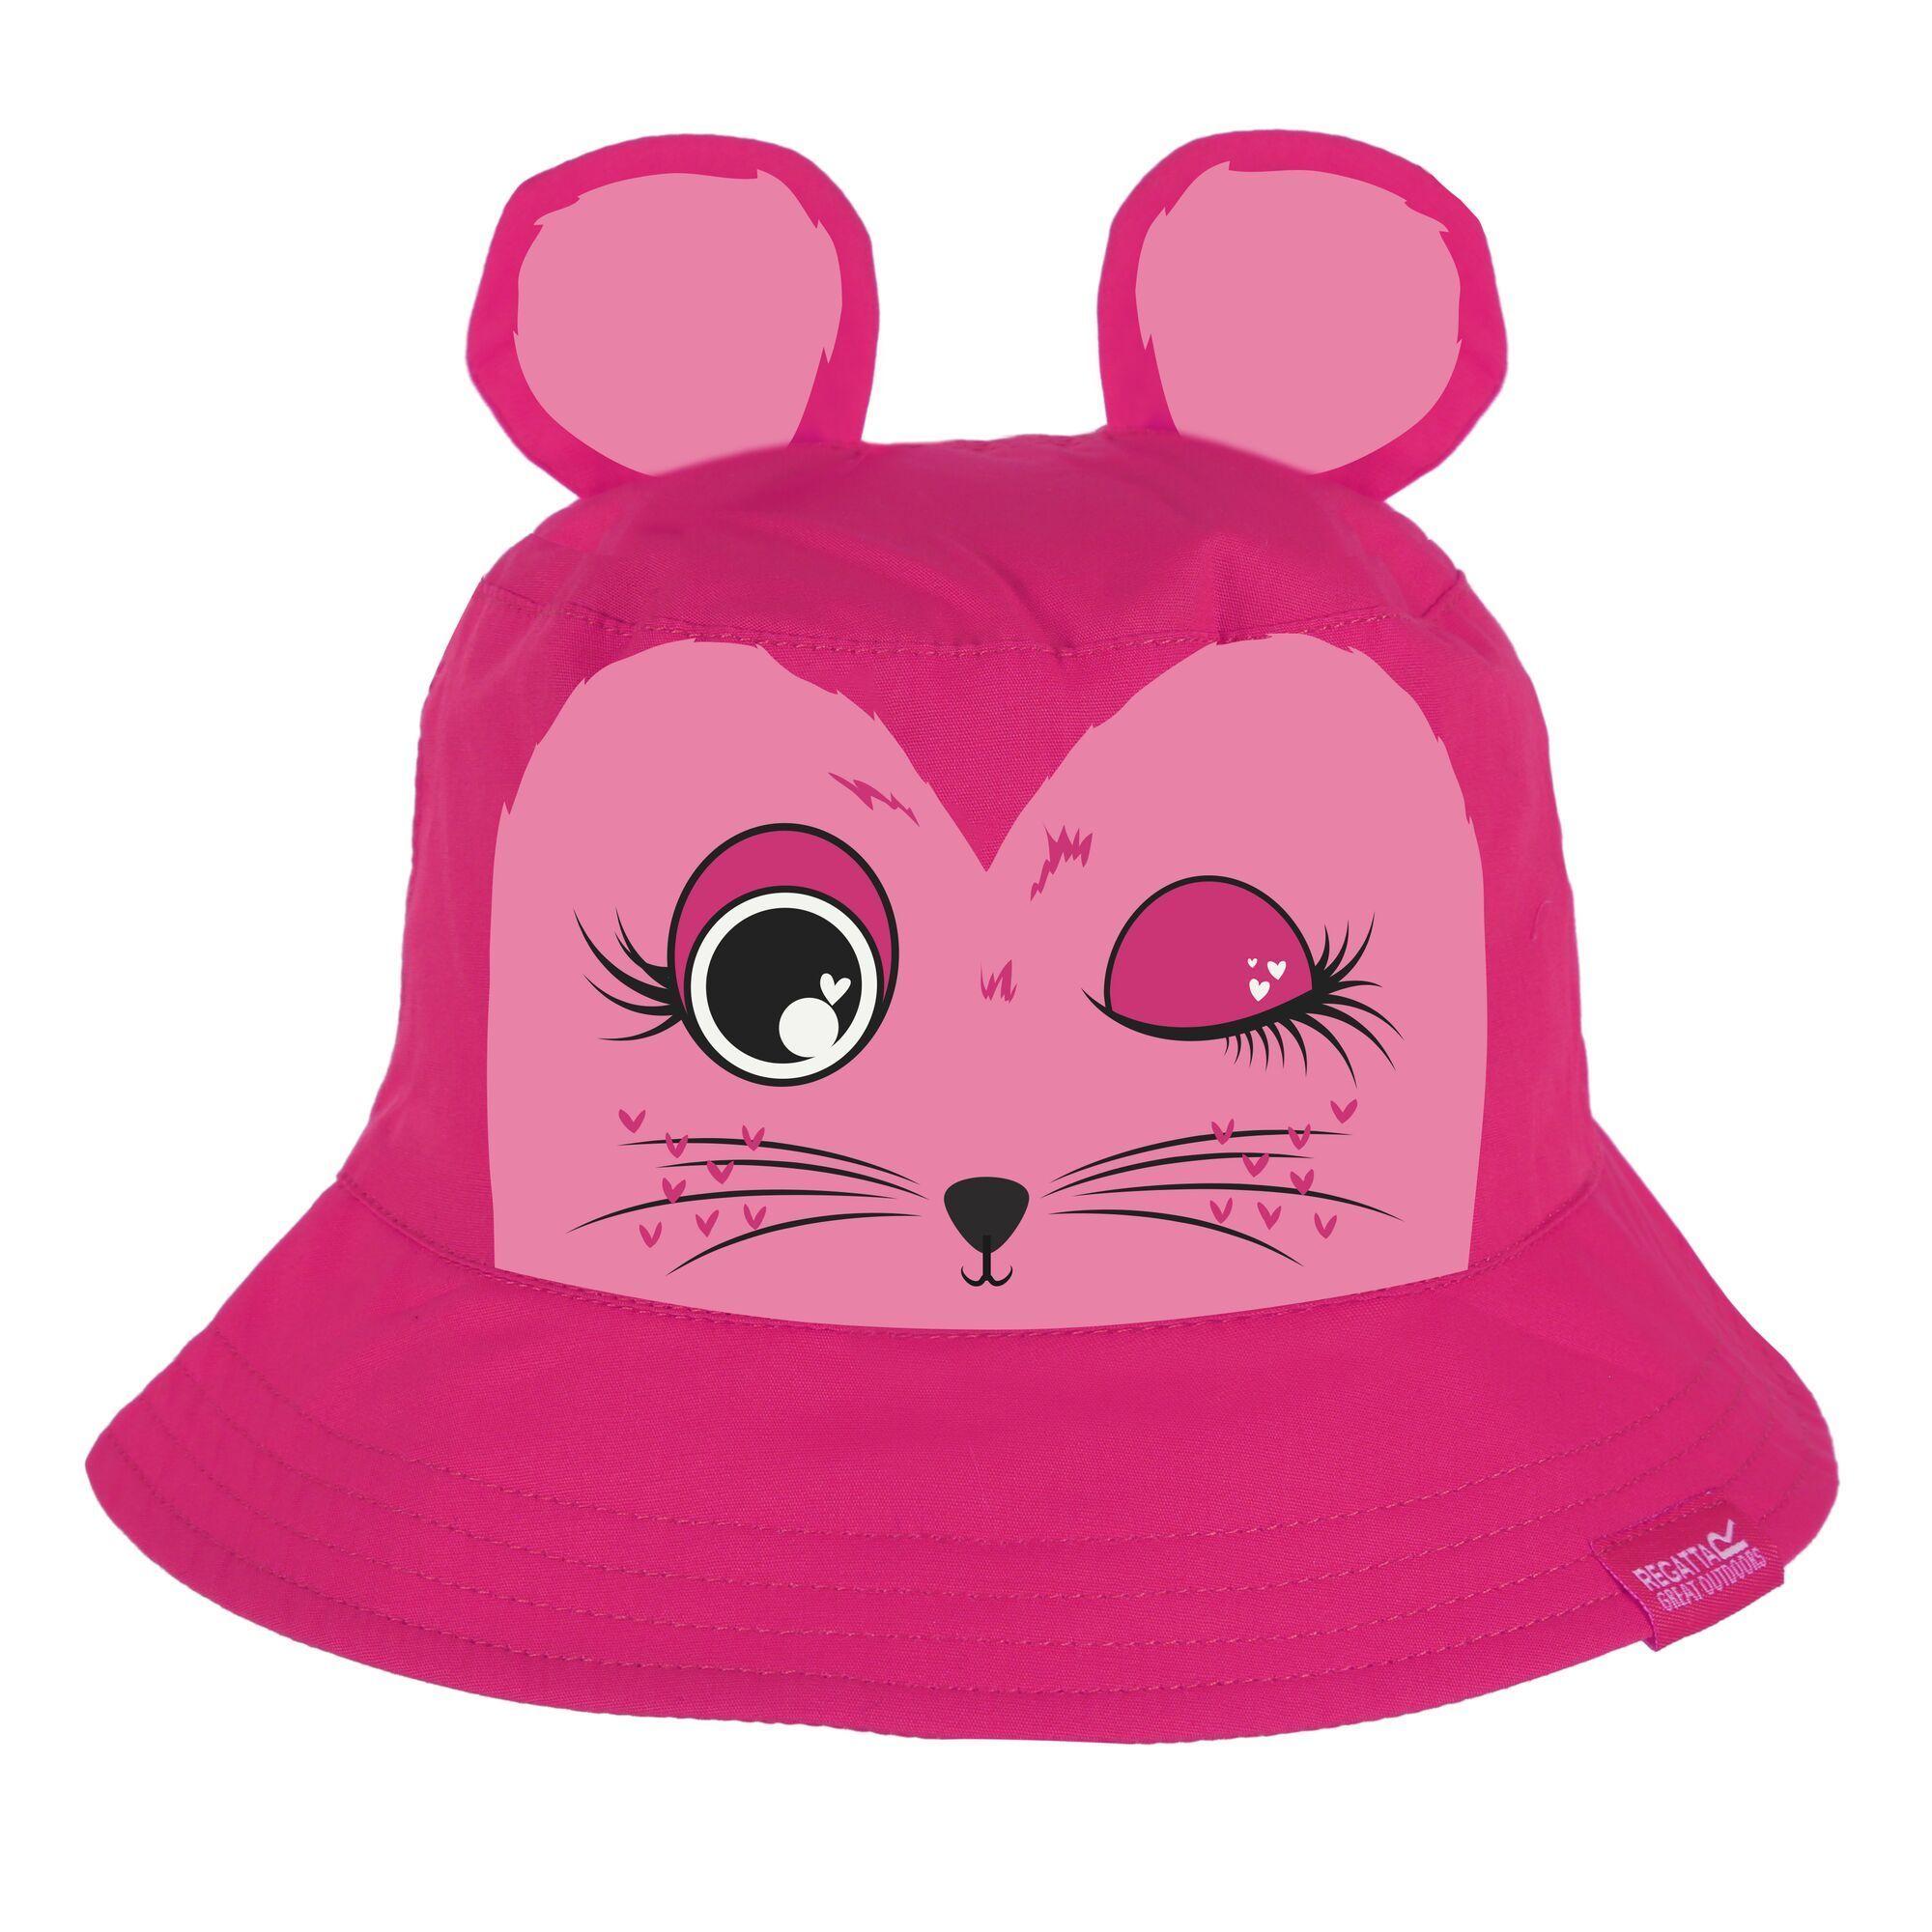 Regatta Childrens/Kids Coolweave Cotton Calix Hat